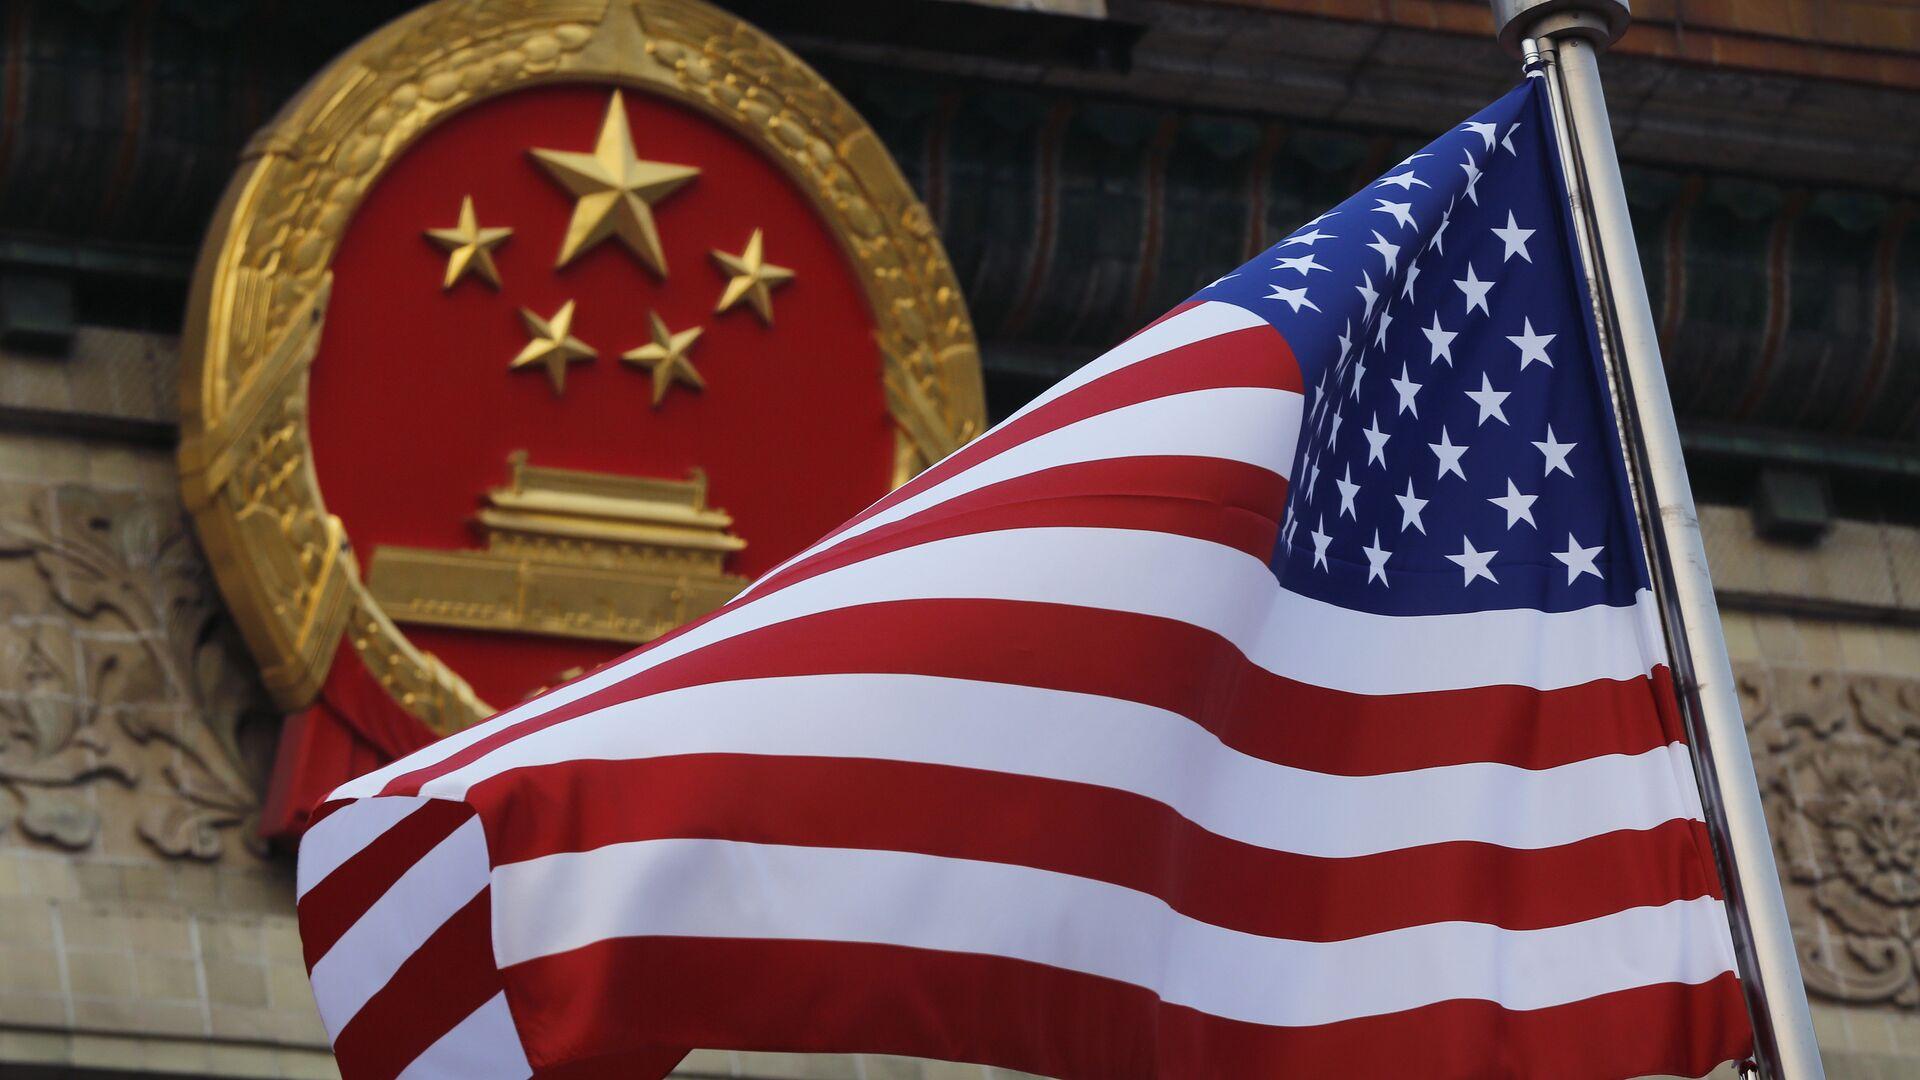 La bandera de EEUU y el emblema de China  - Sputnik Mundo, 1920, 09.06.2021